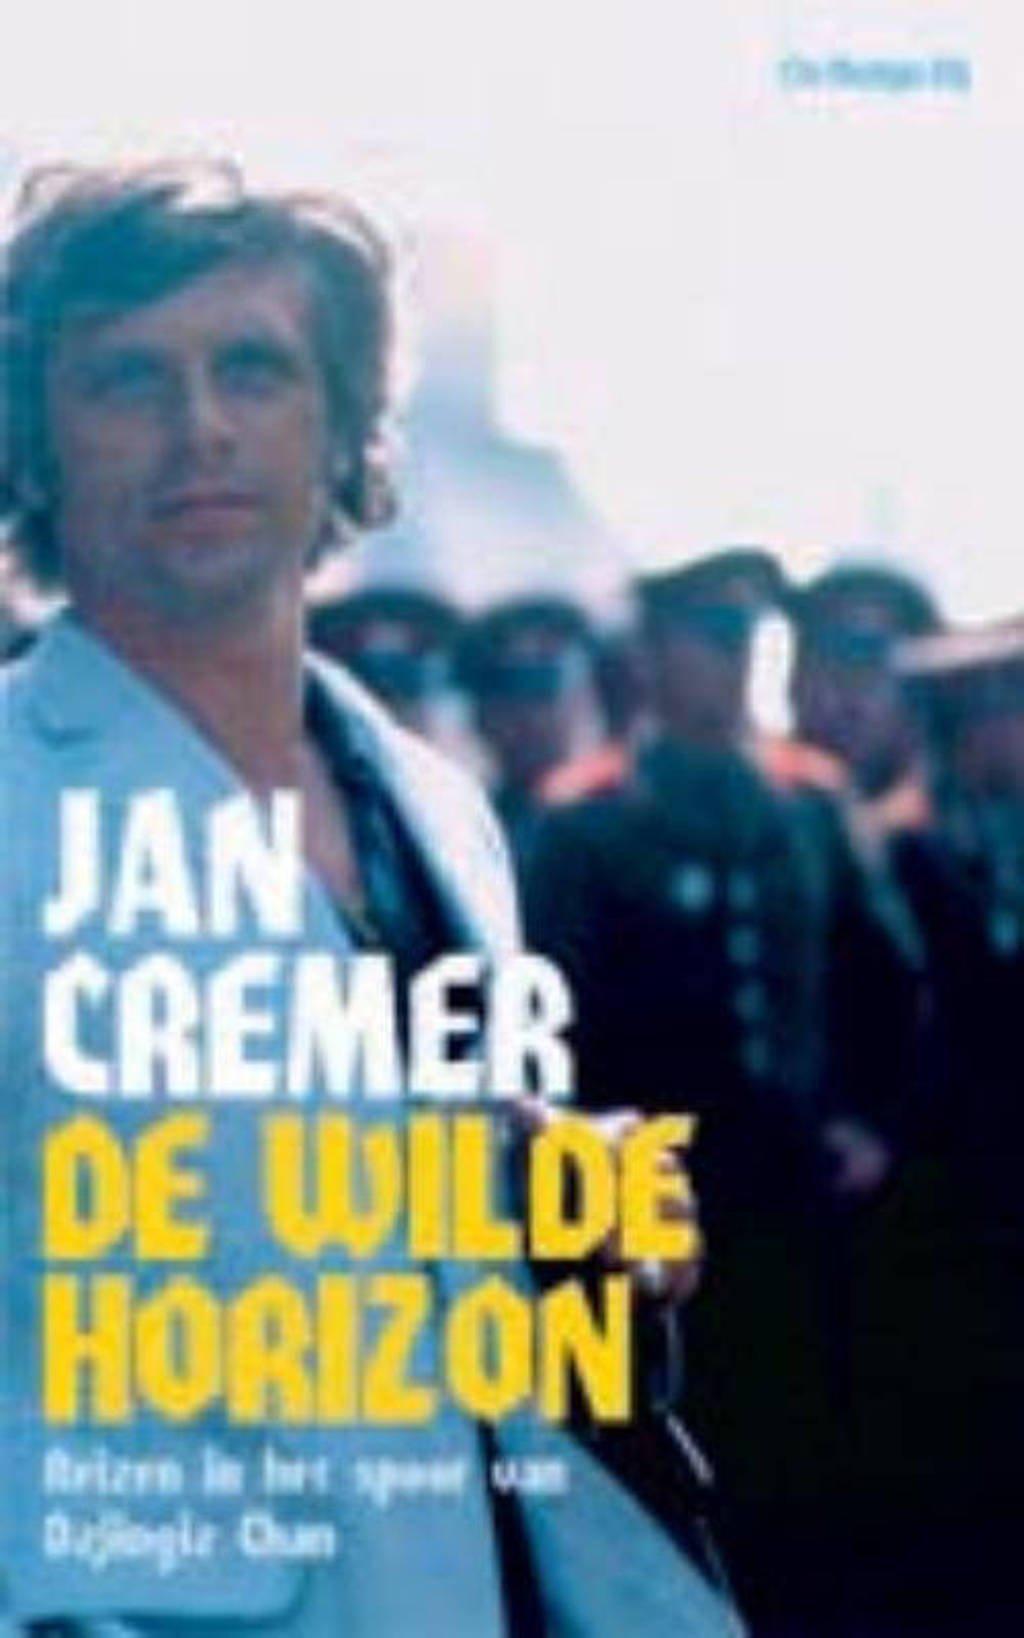 De wilde horizon - Jan Cremer